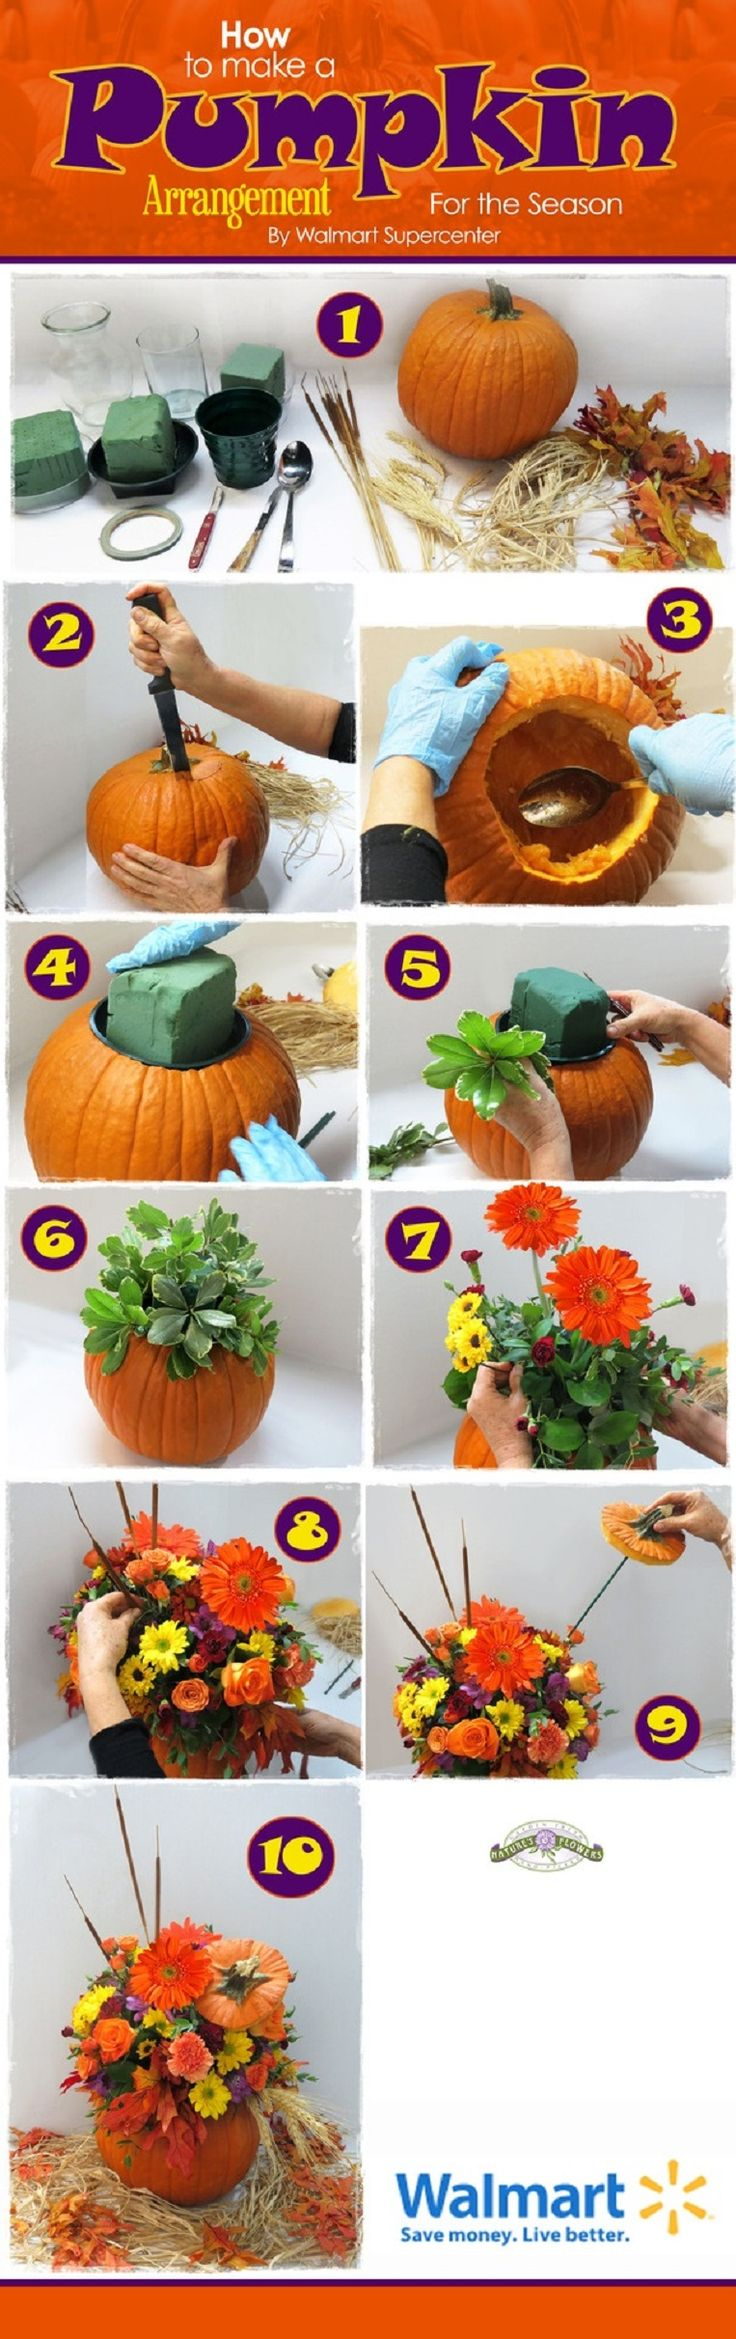 DIY Pumpkin Flower Arangement - 12 Idyllic Flower Arrangement Tutorials | GleamItUp